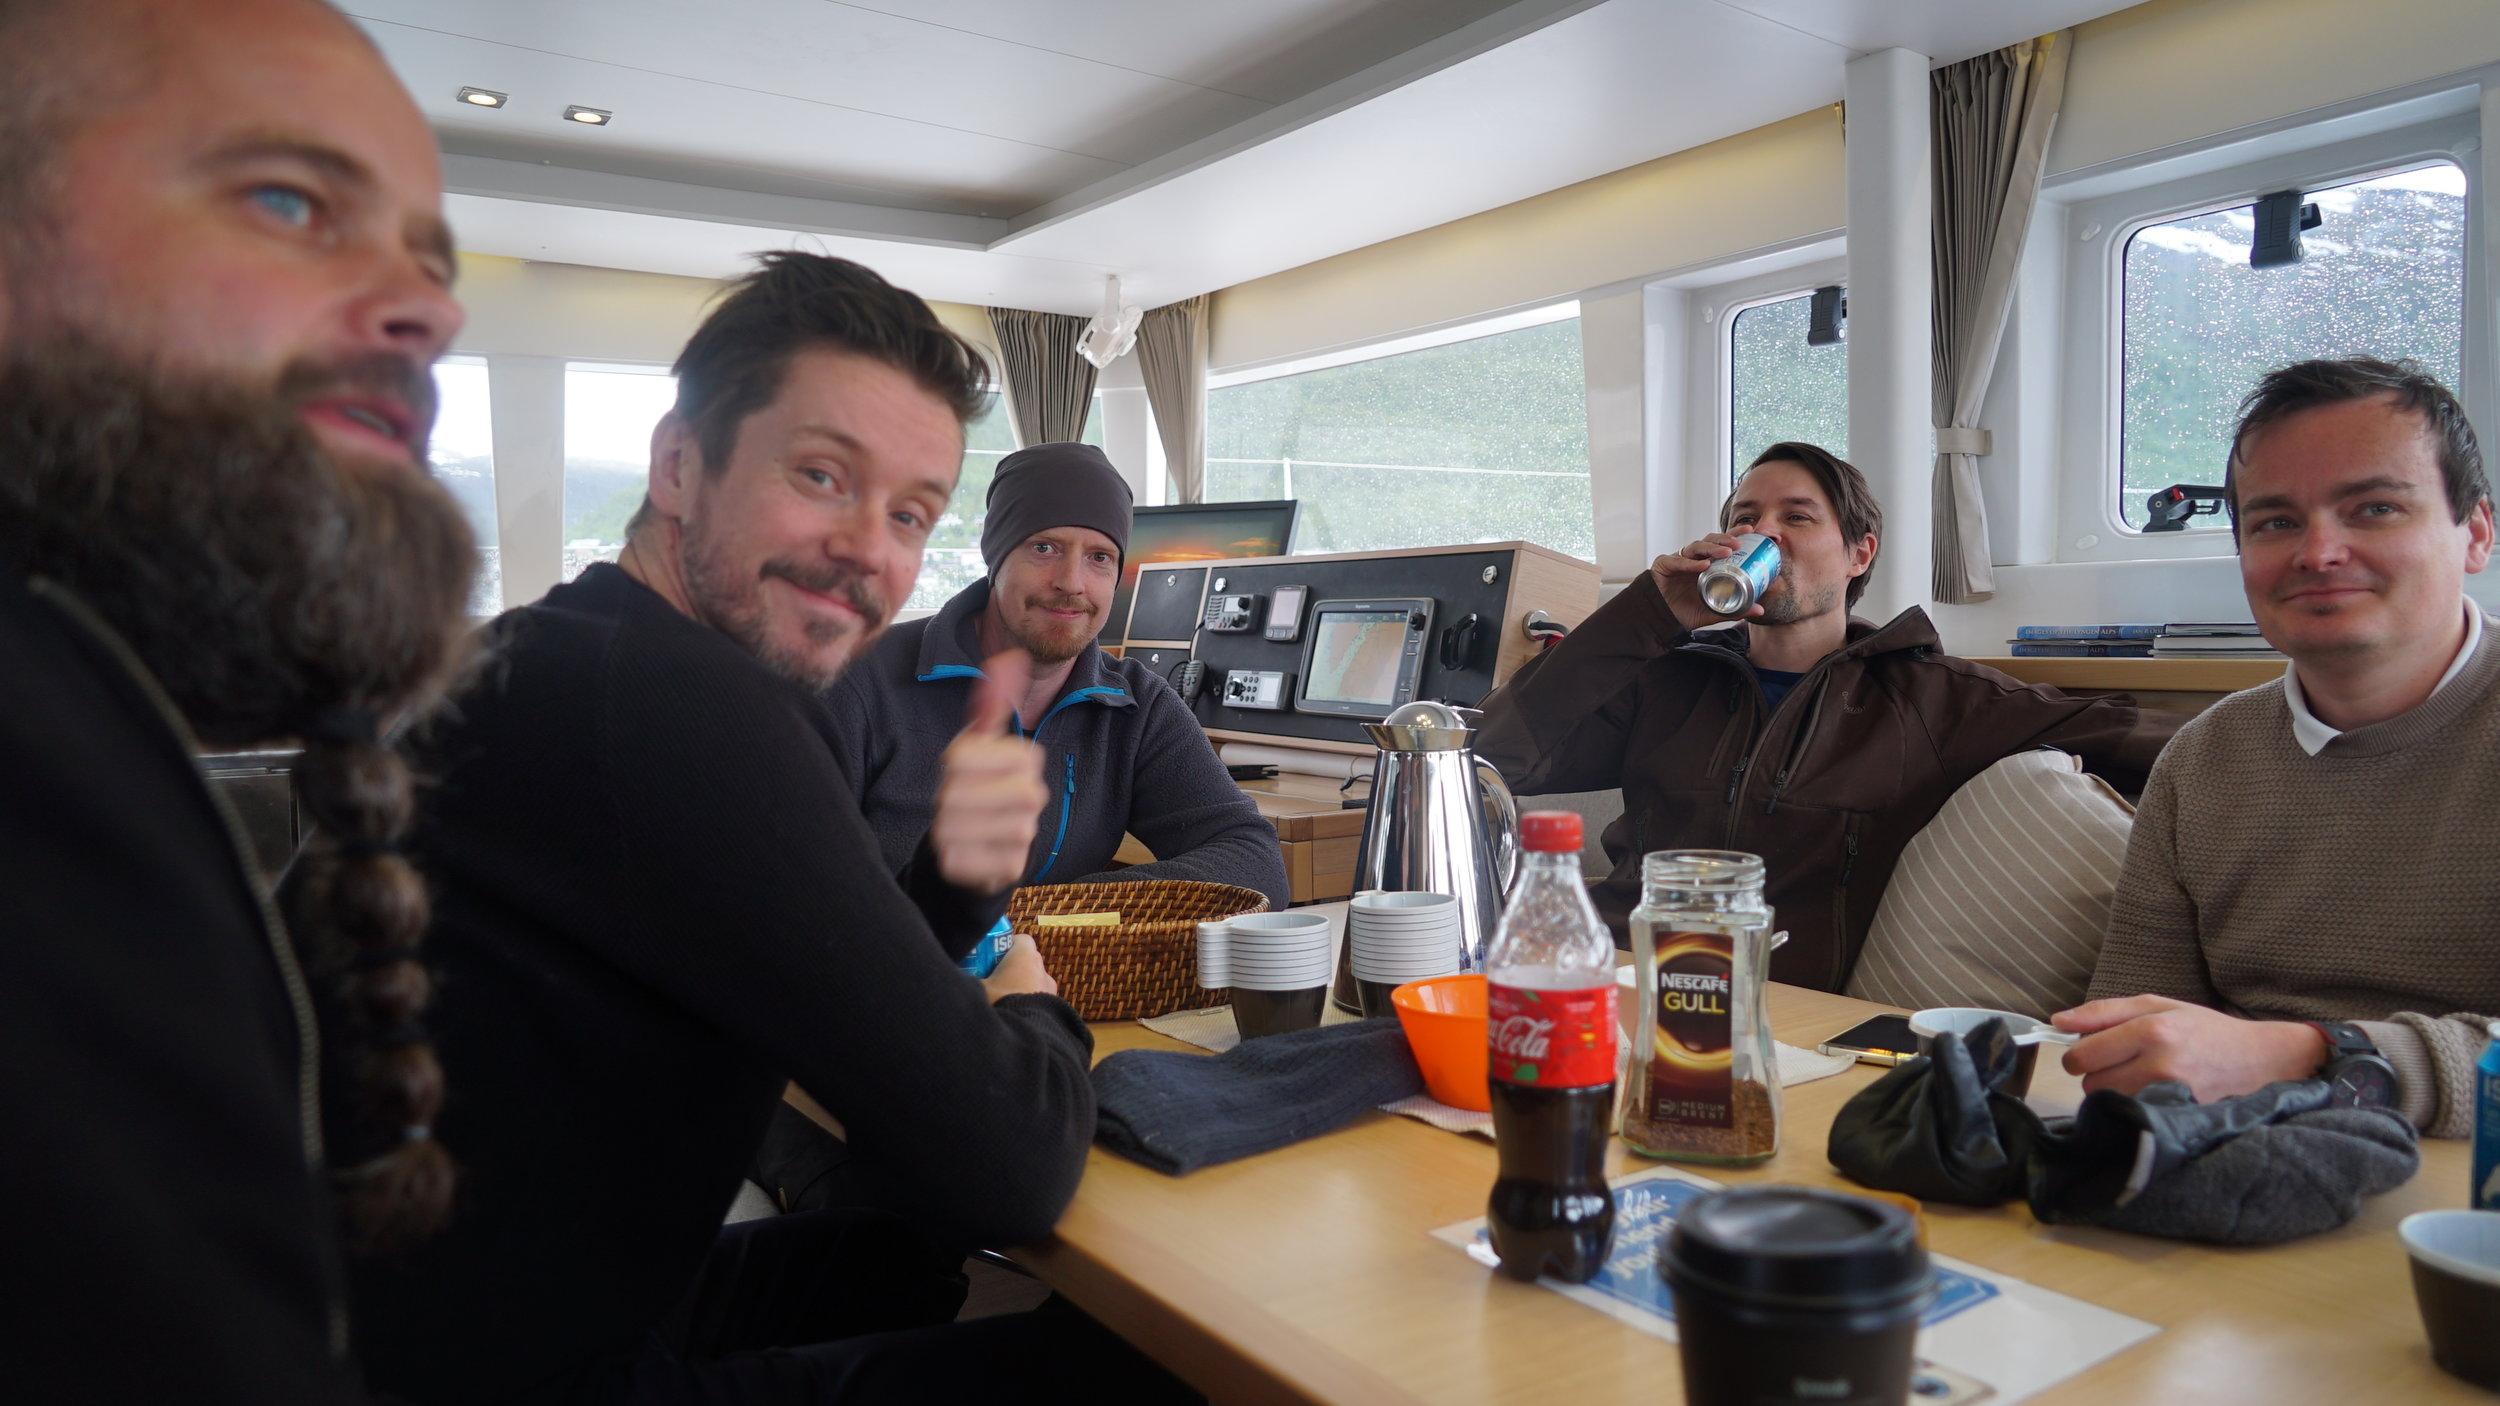 Utdrikningslag |#Tromsø | #Sail and Relax